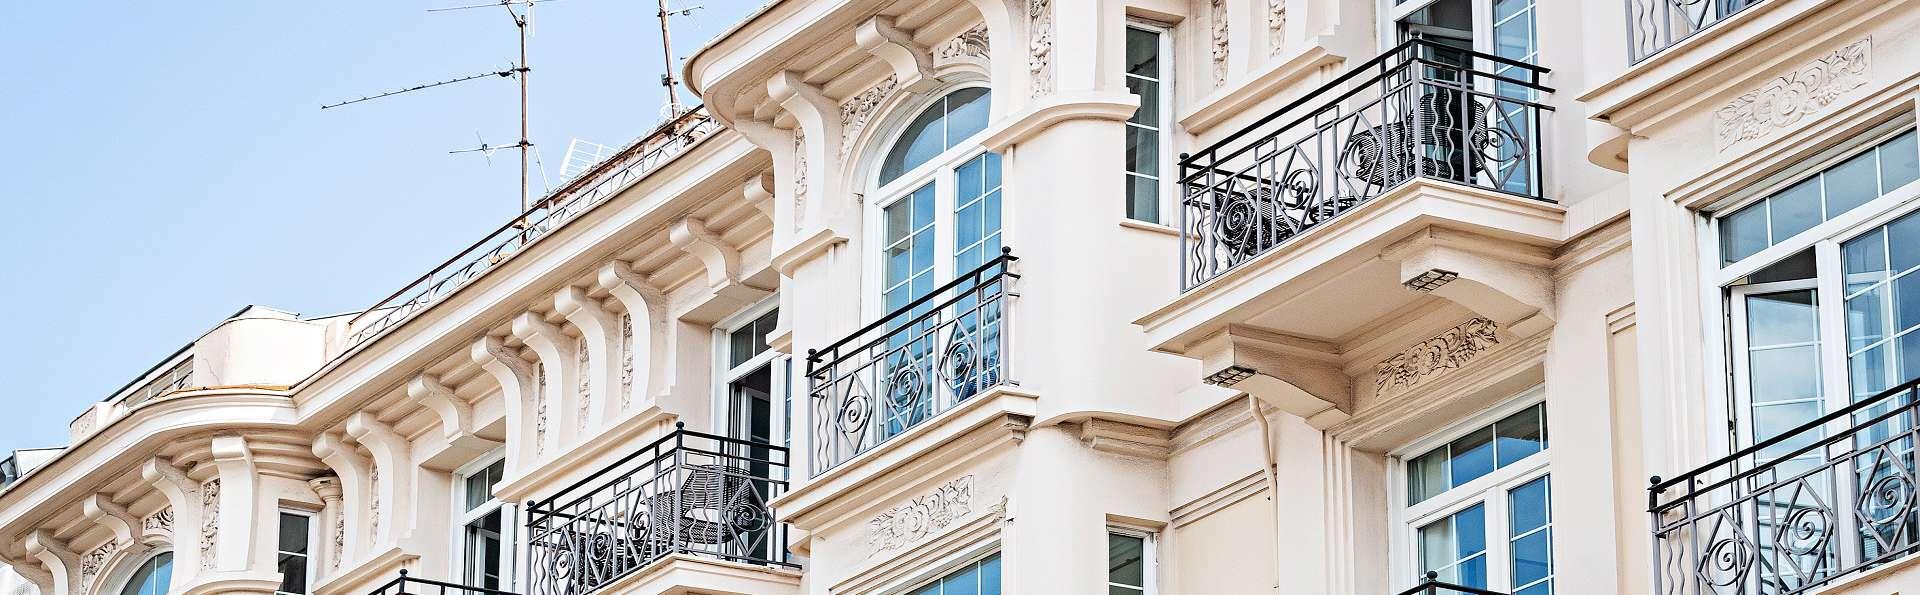 Hotel Le Riviera Collection, BW Signature Collection - _Riviera_Collection_Nice_France_2021__Yann_Deret-4242.jpg